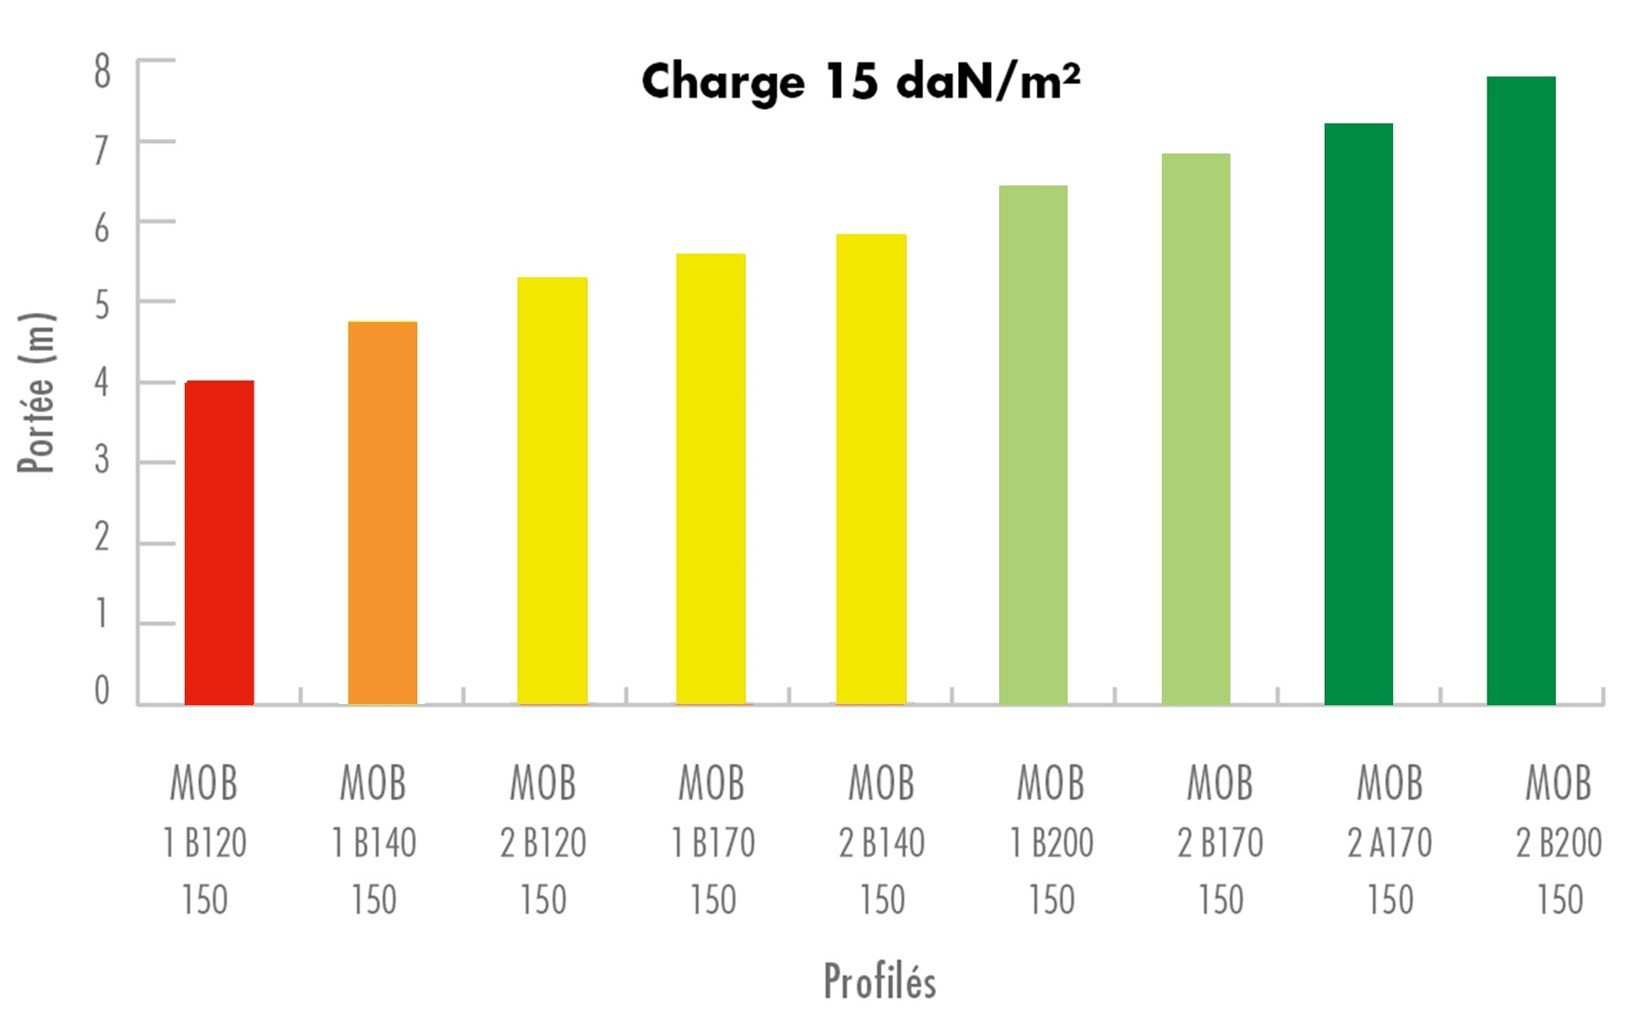 Knauf GH Futur autoportant - Charge 15 daN